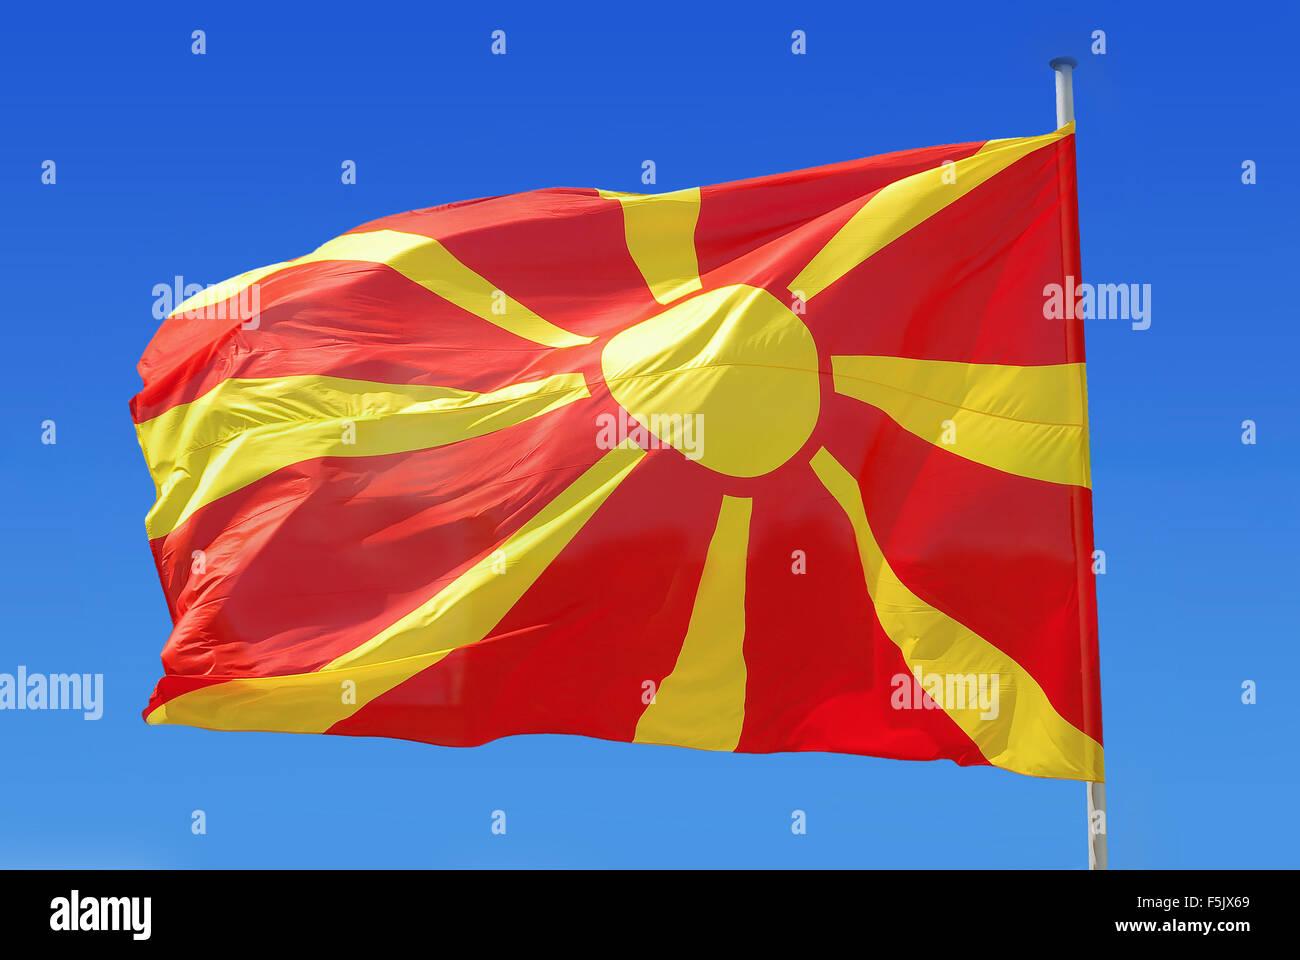 Macedonia flag - Stock Image